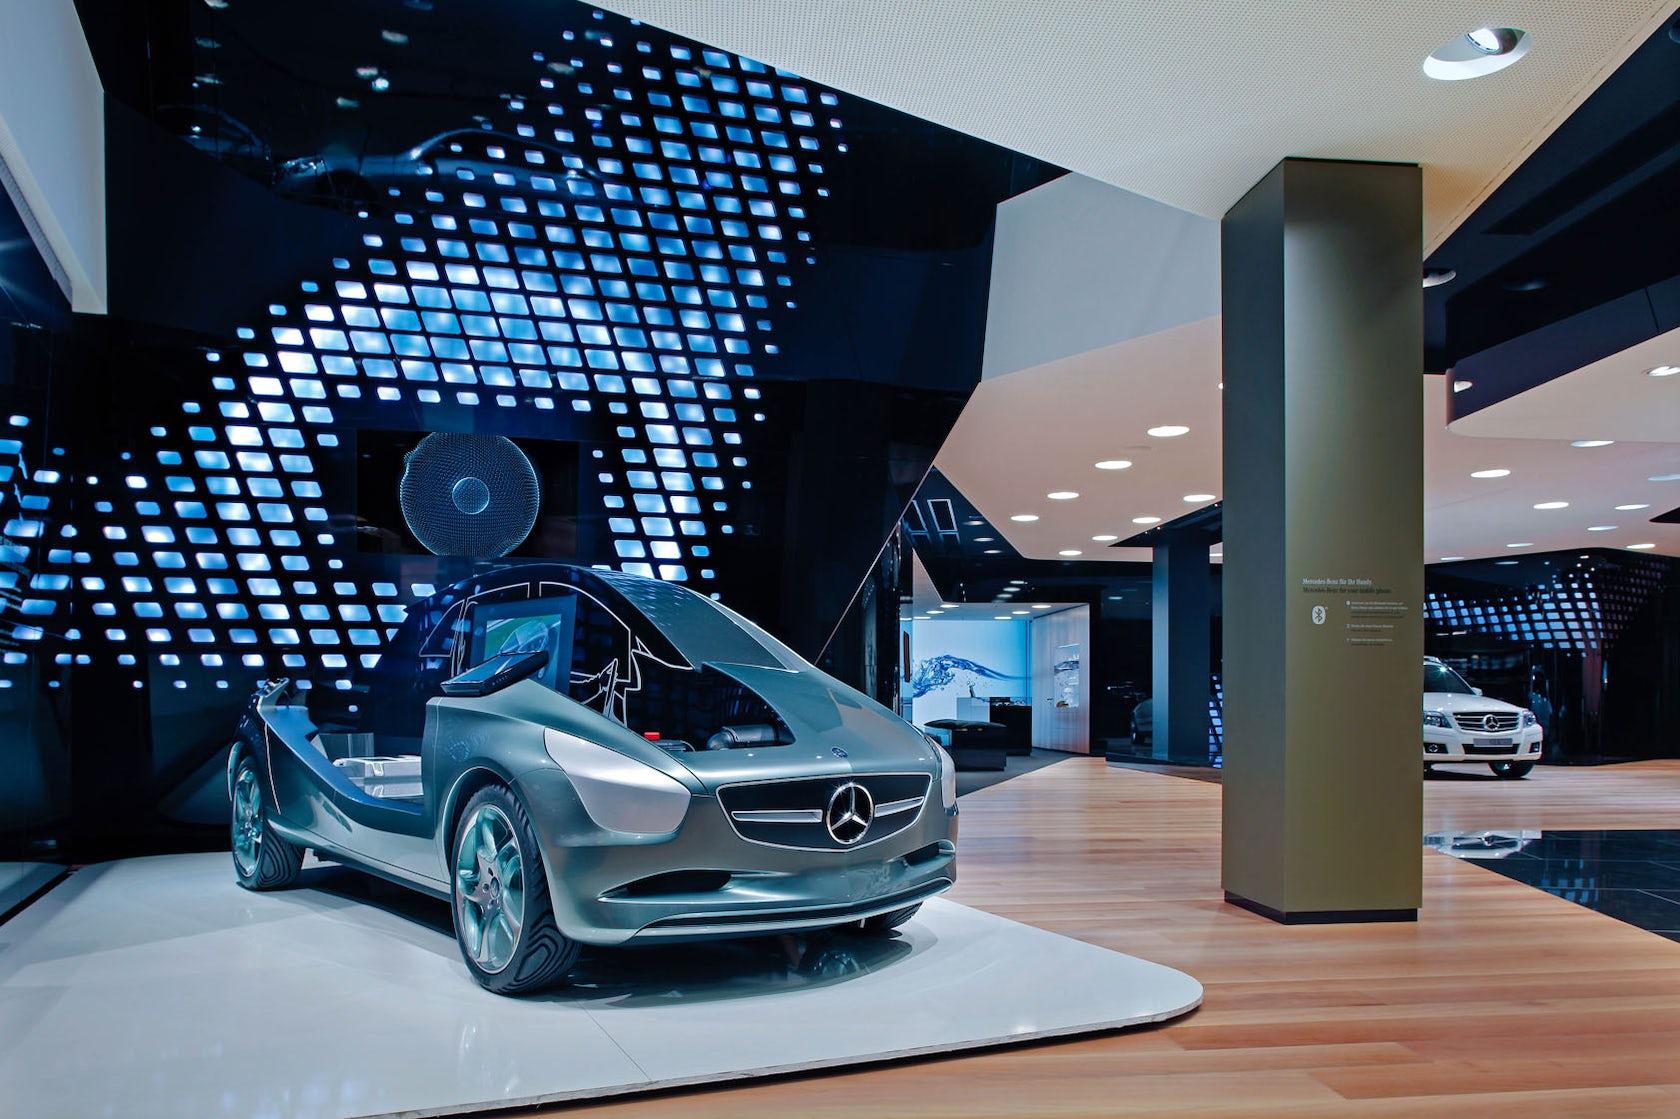 showroom 39 mercedes benz gallery 39 berlin architizer. Black Bedroom Furniture Sets. Home Design Ideas